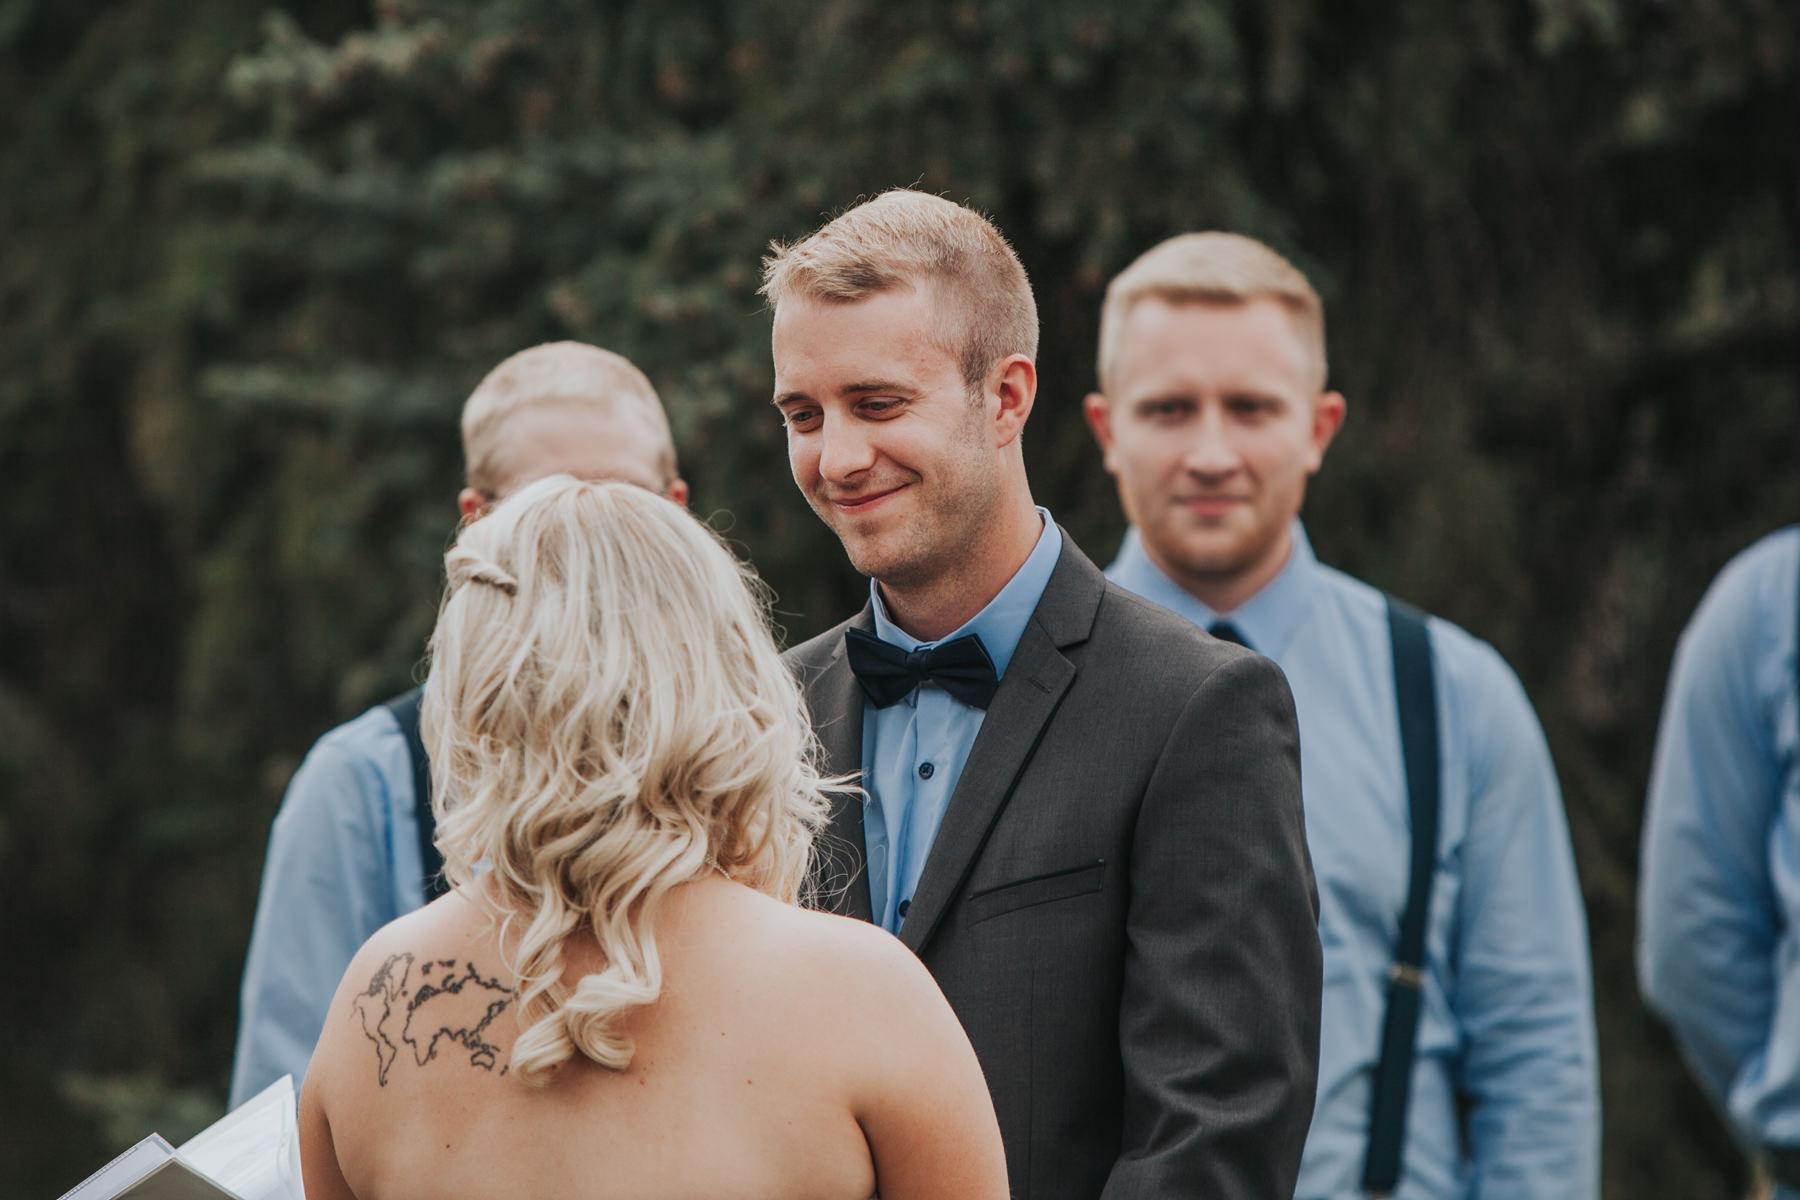 Vancouver wedding photographer Jess 10